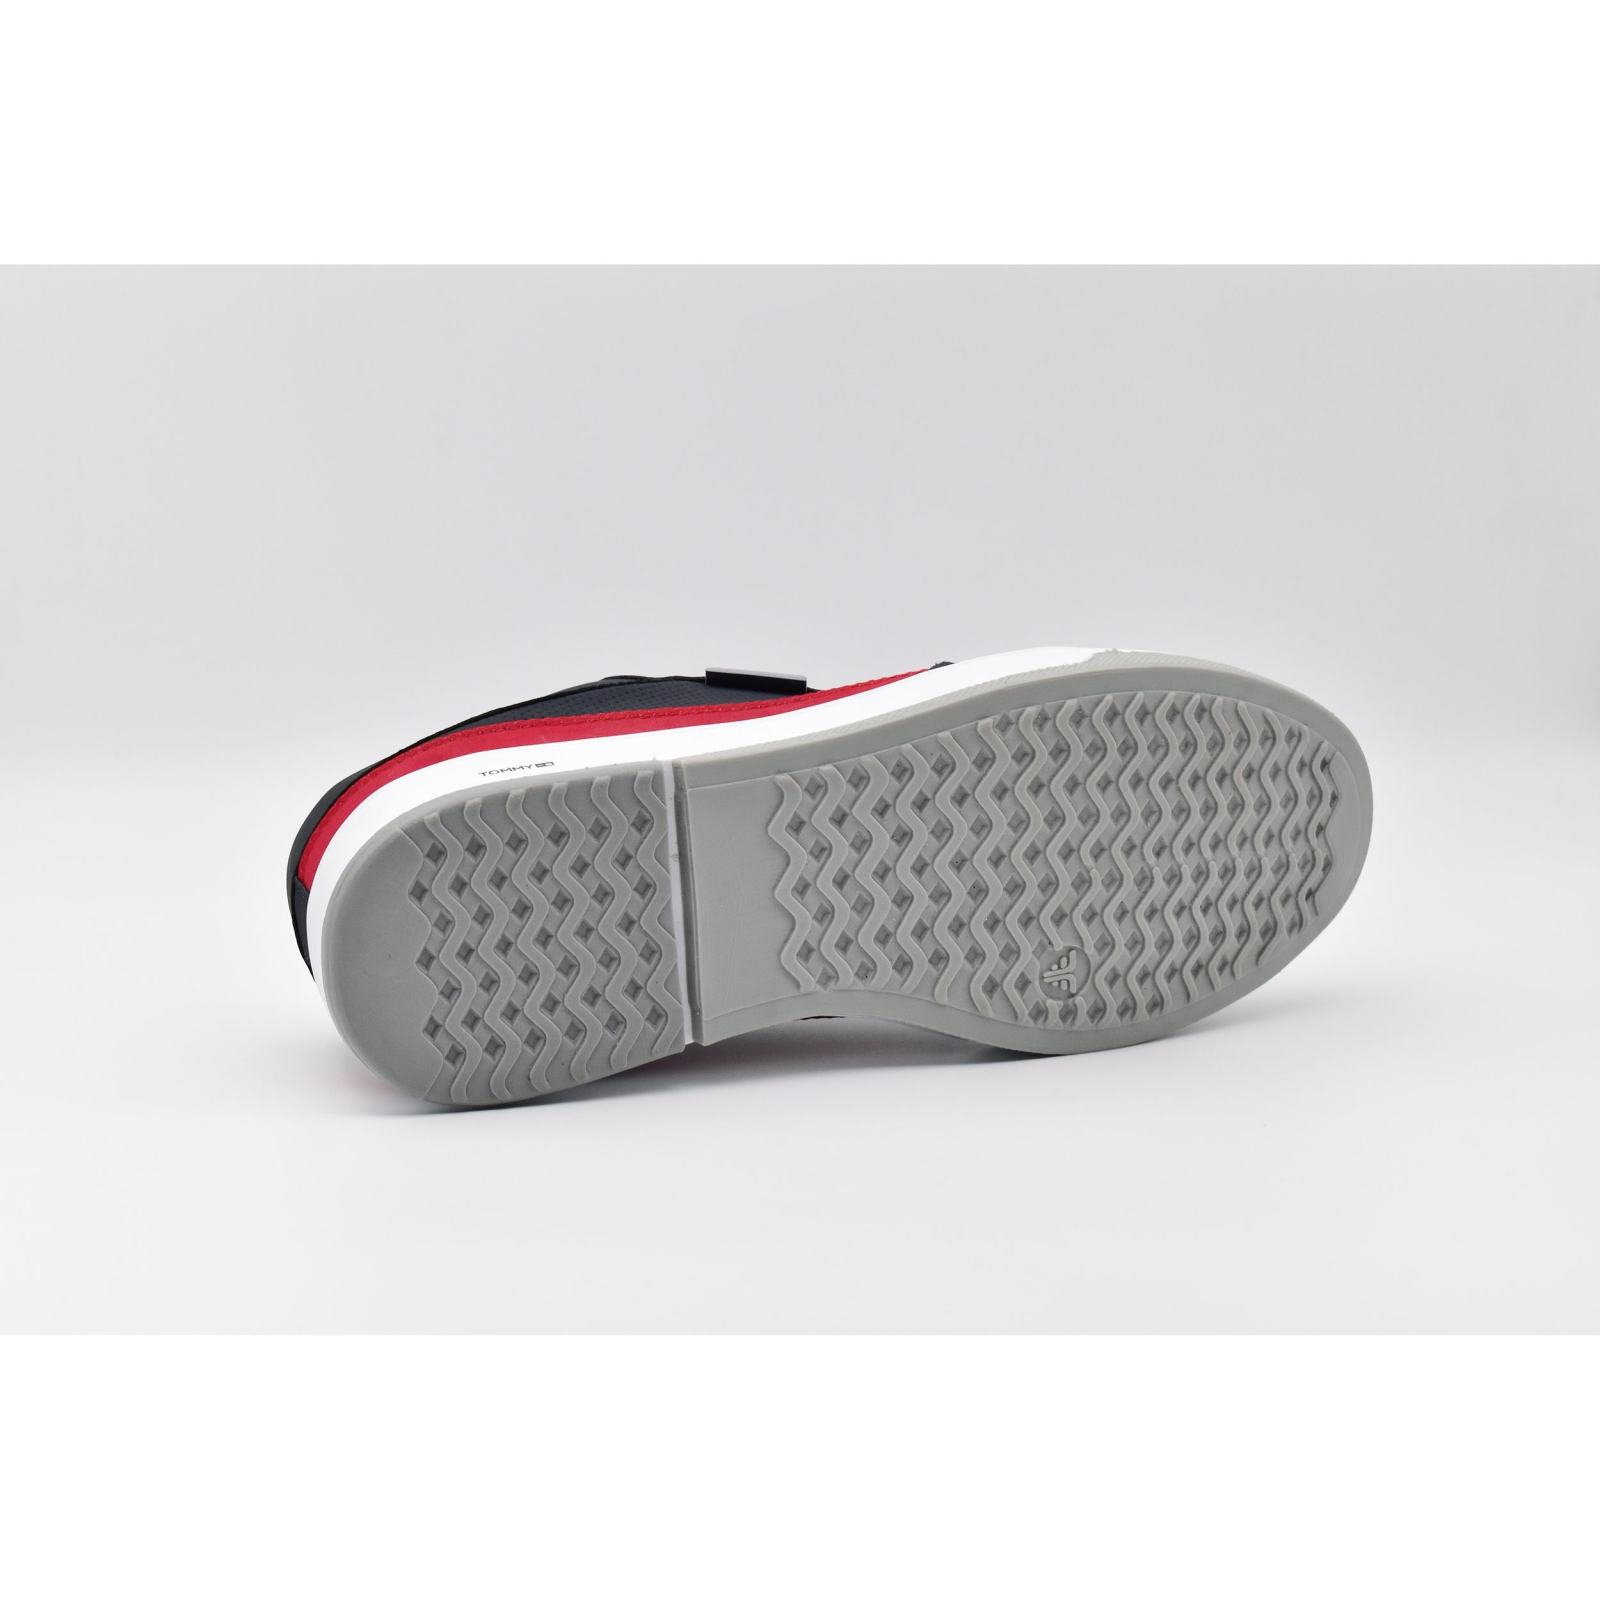 کفش روزمره مردانه مدل رهاورد کد 5513 -  - 9